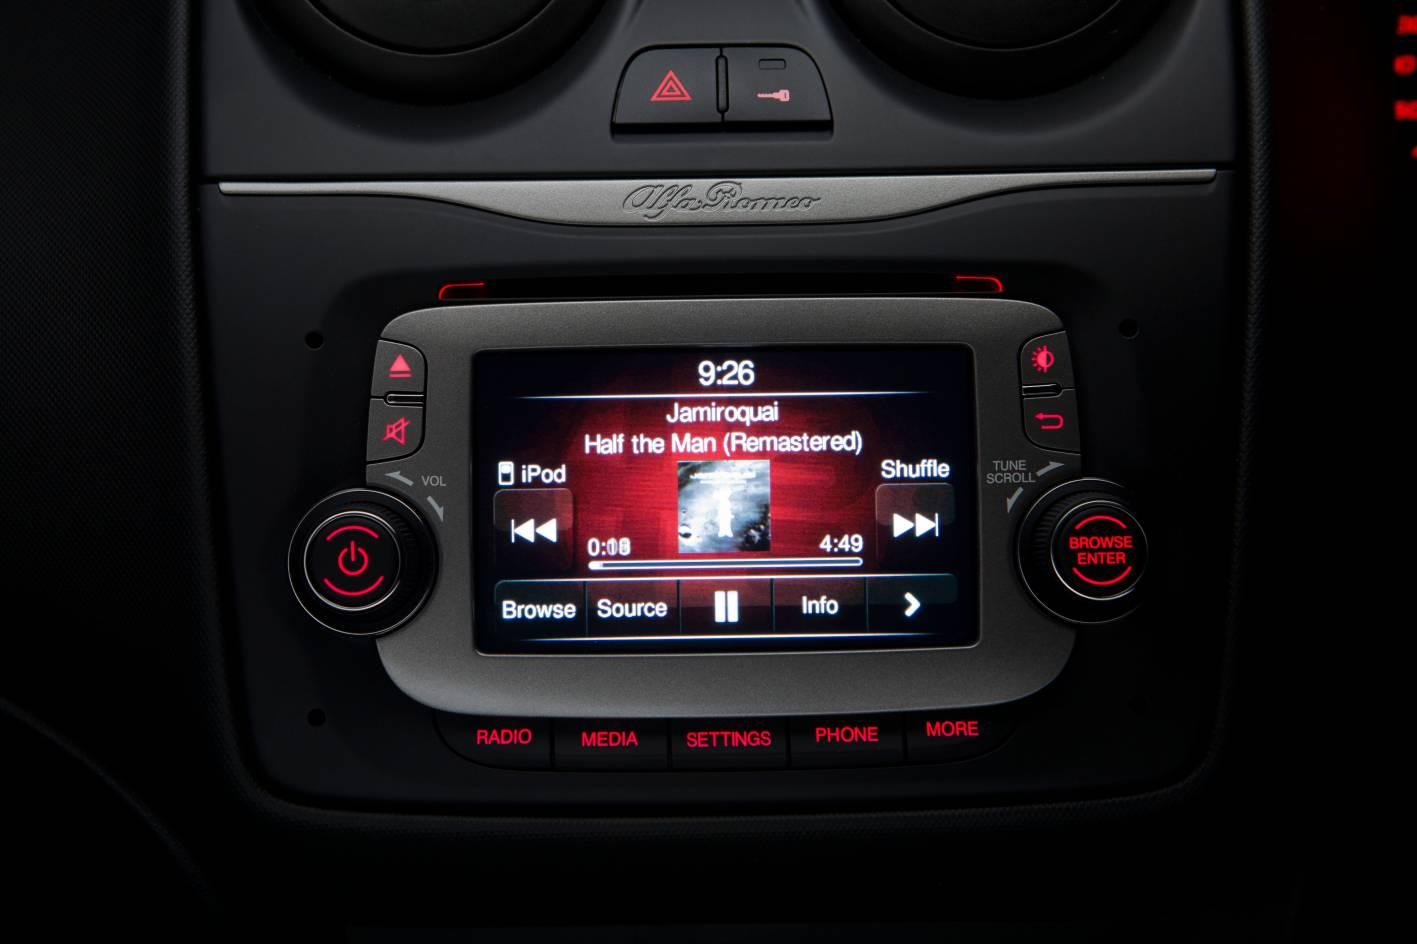 2014 Alfa Romeo Mito Interior Uconnect System Forcegt Com